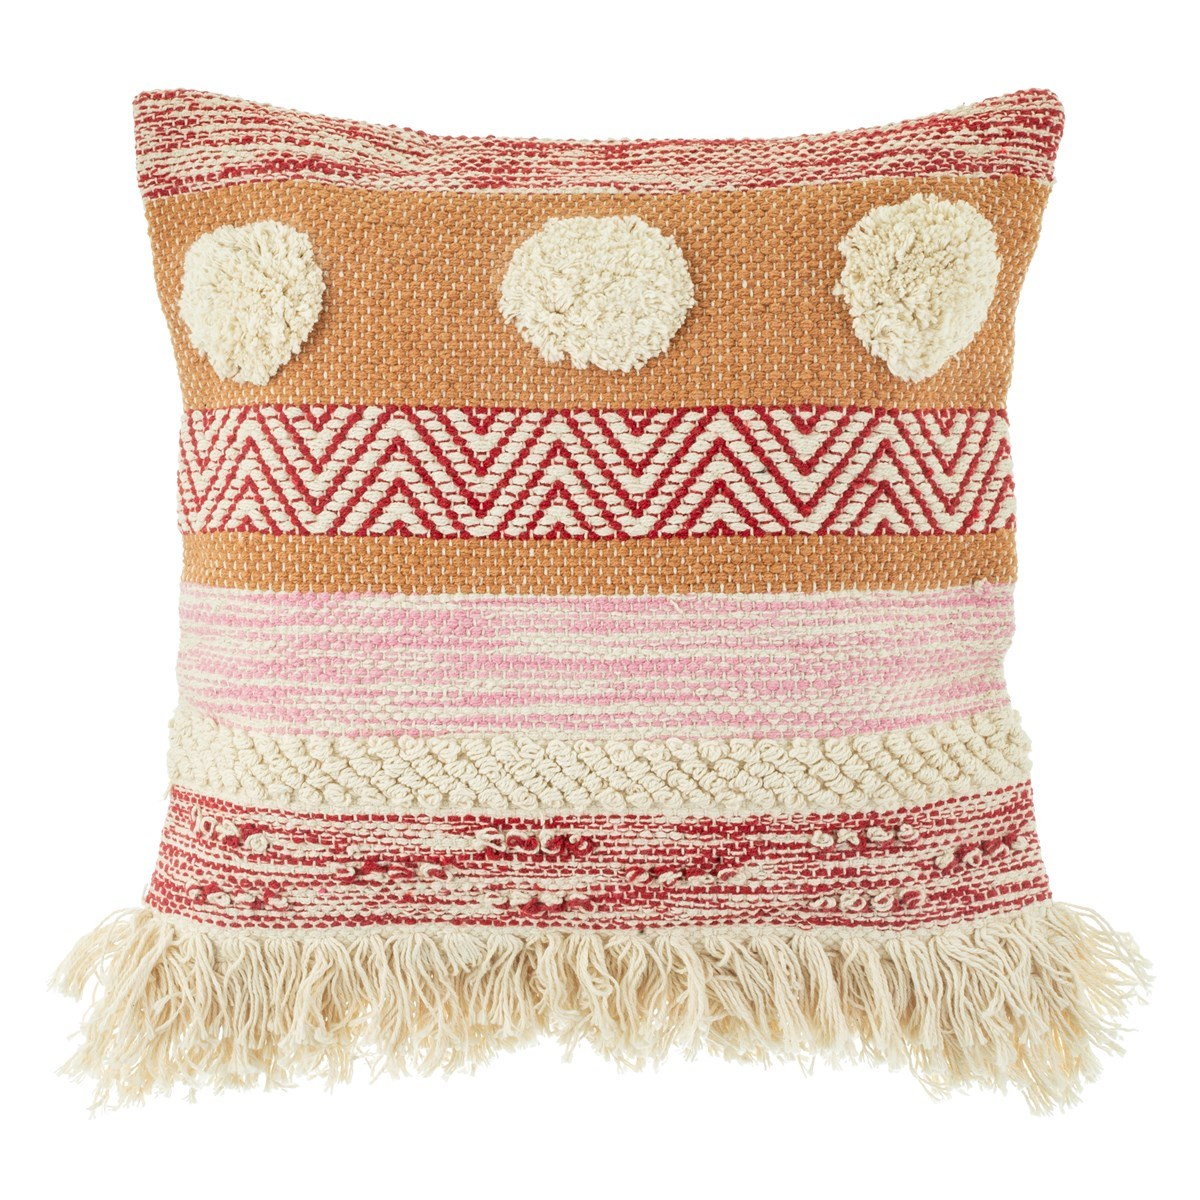 Sass /& Belle Lima Llama Cushion with Tassels